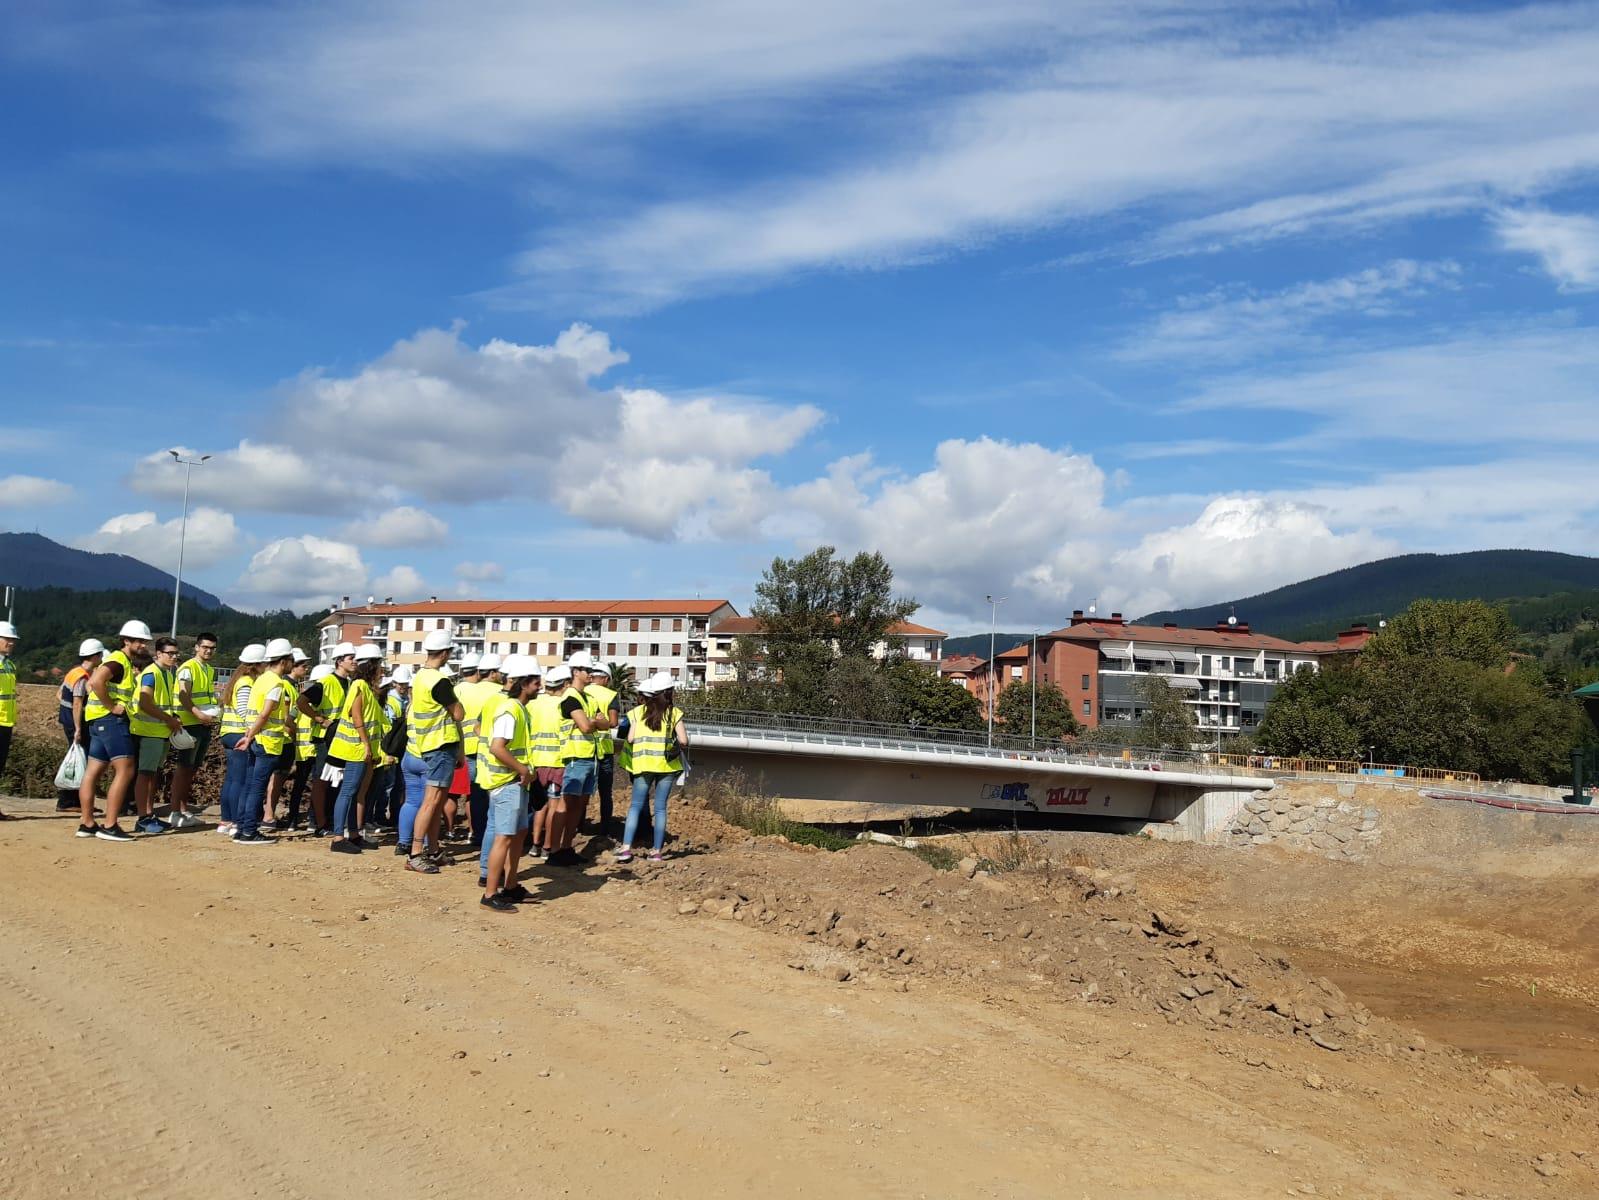 Estudiantes_de_Ingenier_a_Civil_de_la_UPV_frente_al_nuevo_brazo_del_Cadagua.2jpg.jpg